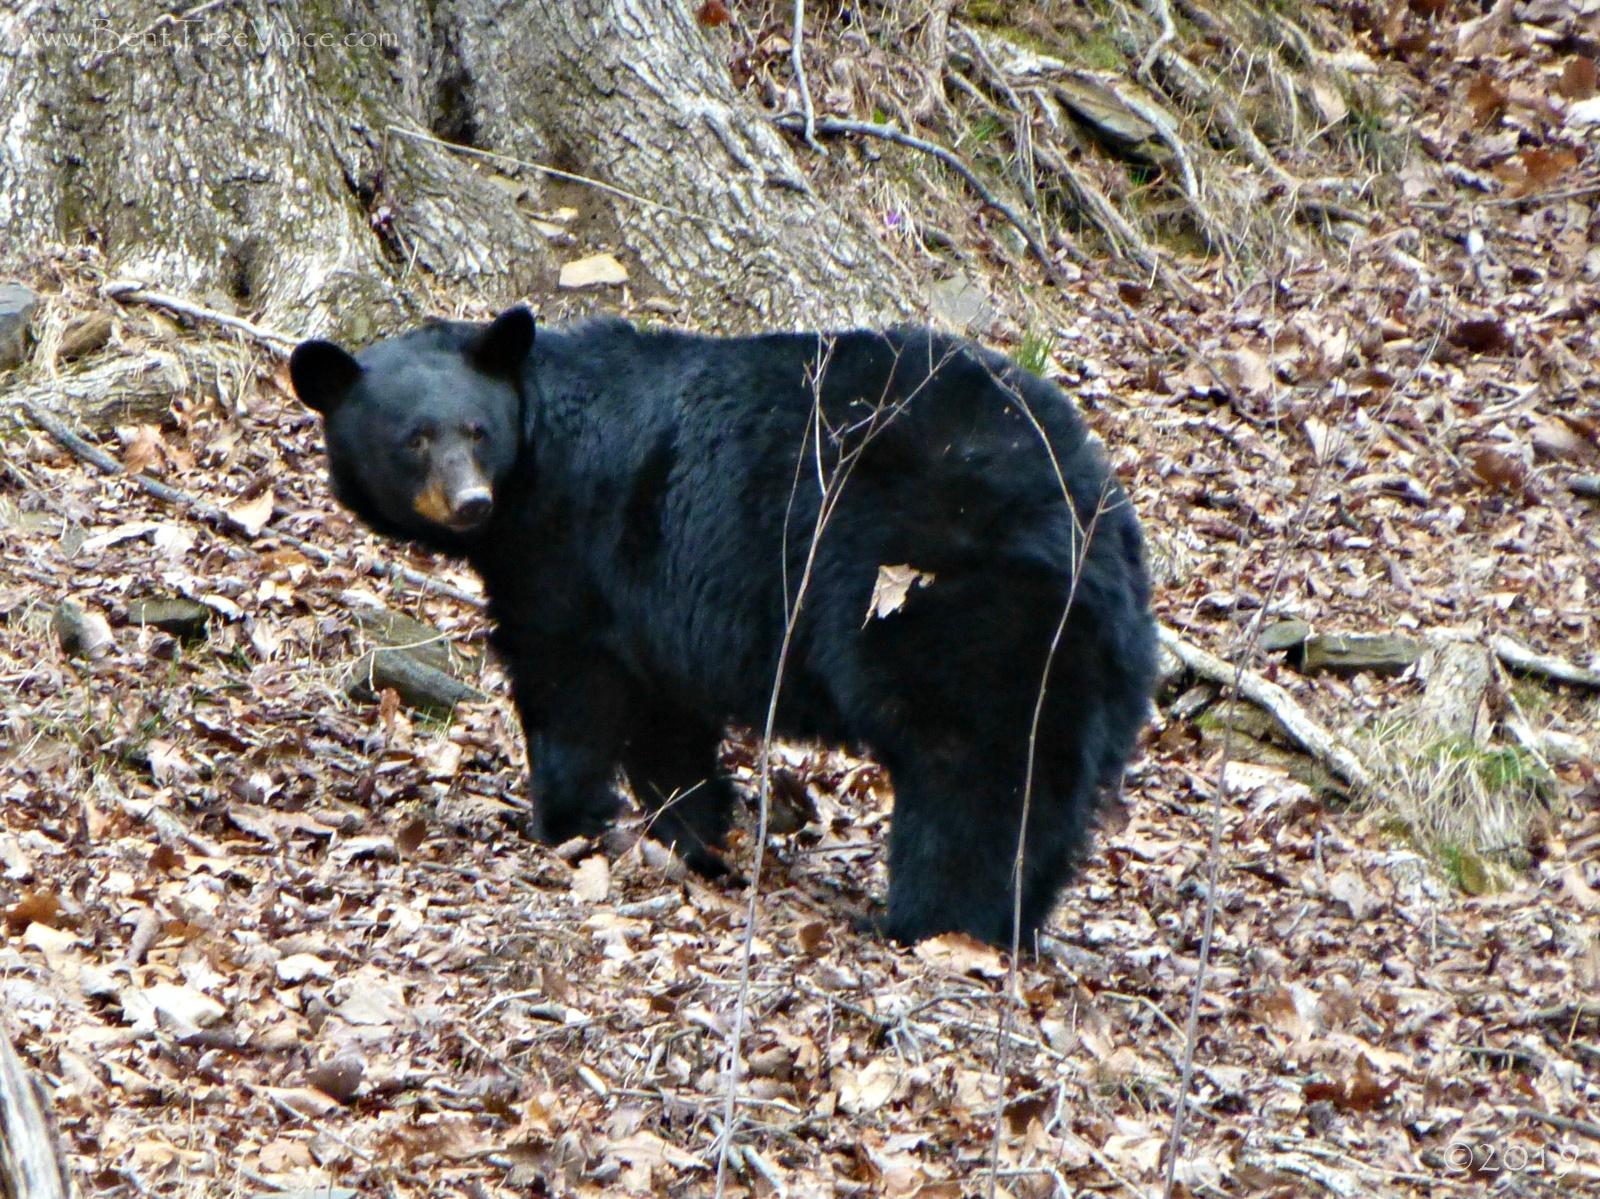 February 26, 2019 - Black Bear in Bent Tree